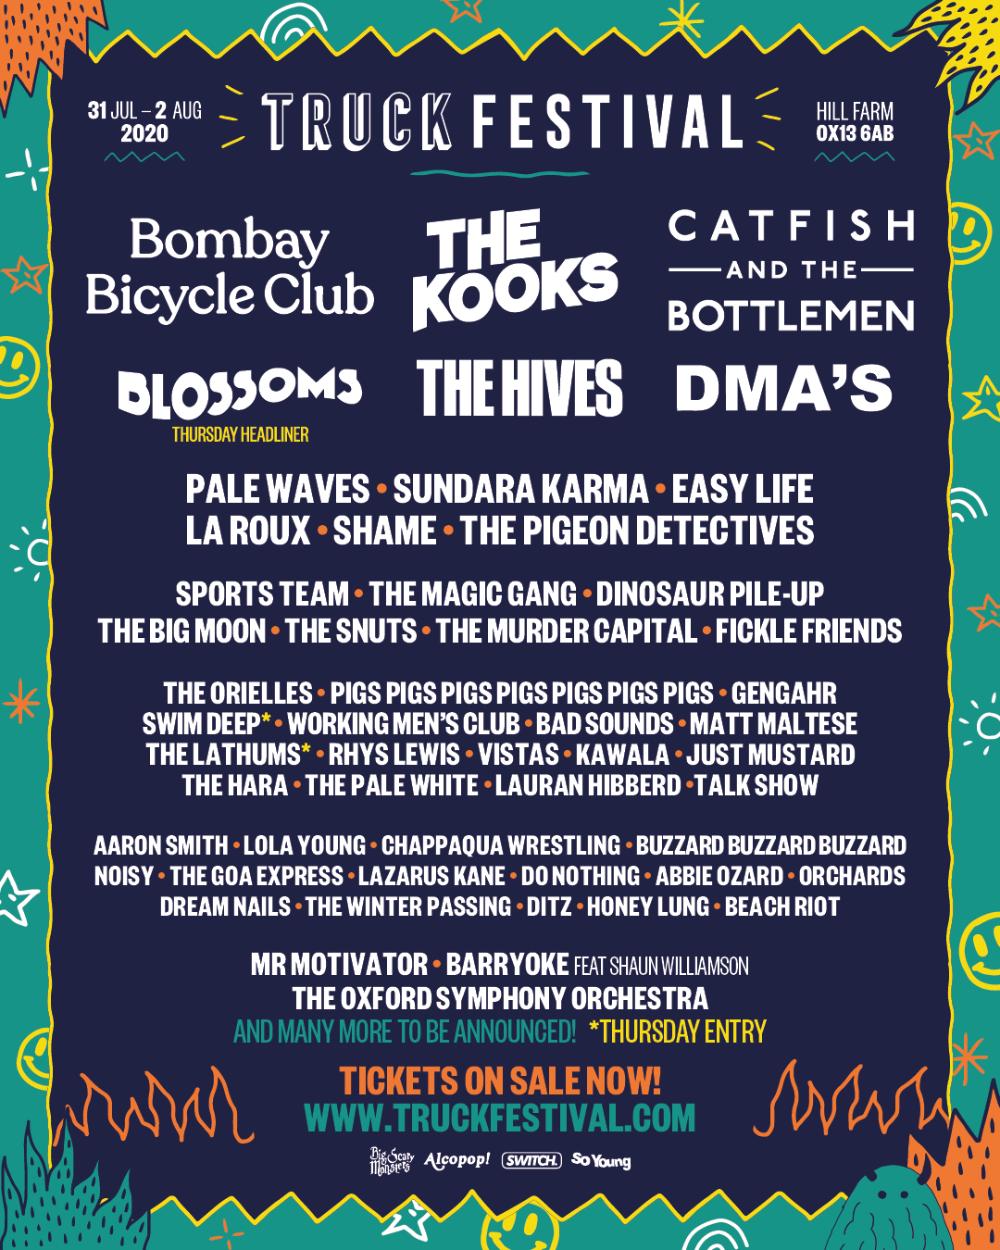 Truck Festival 2020 line-up